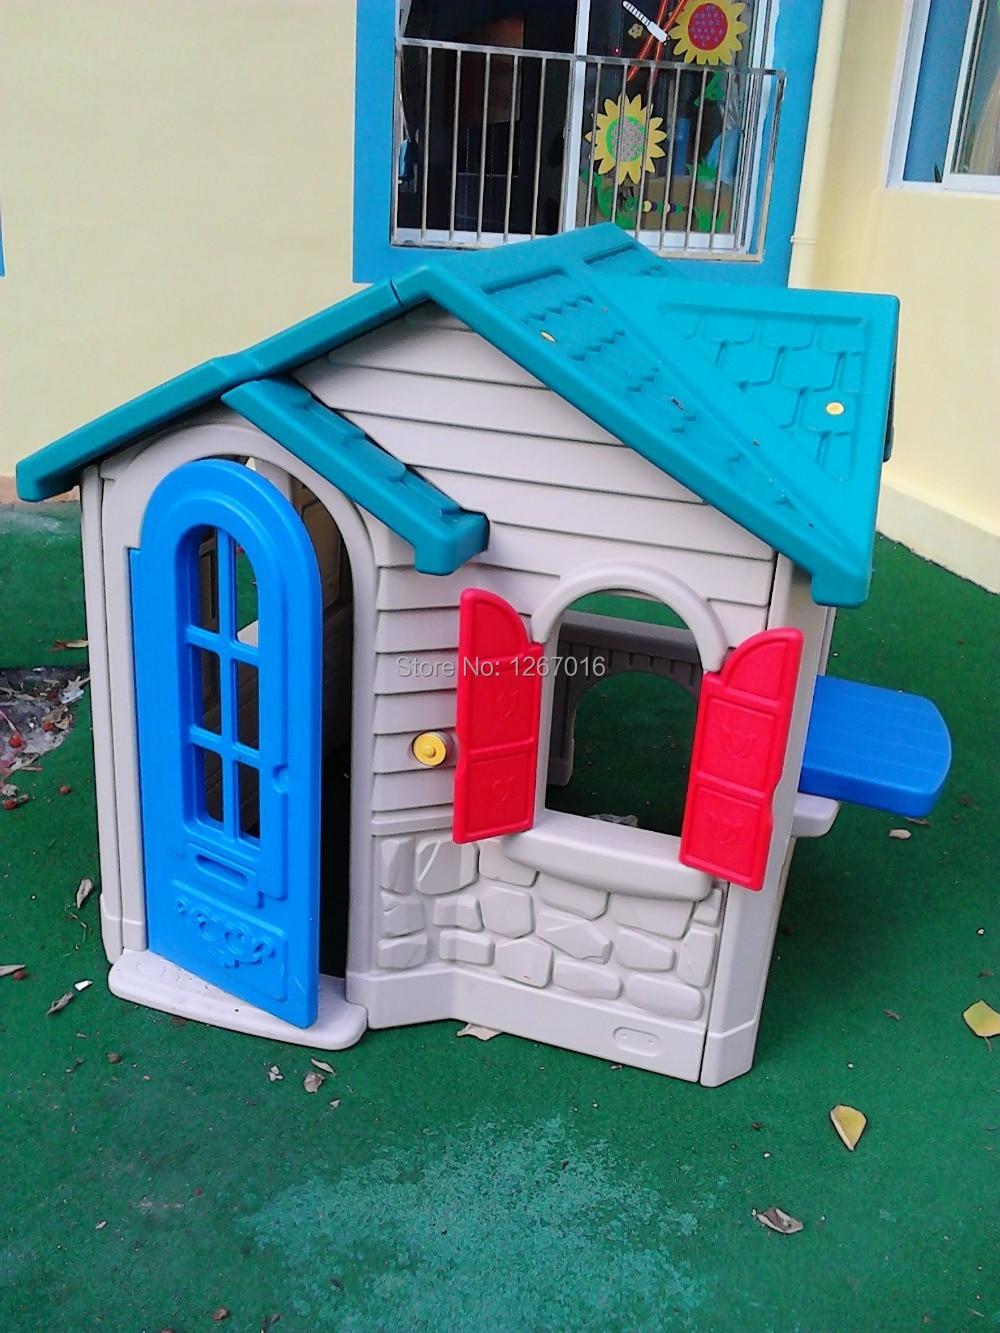 Fadeles Kids Plastic Playhouse Plastic Toy House Plastic